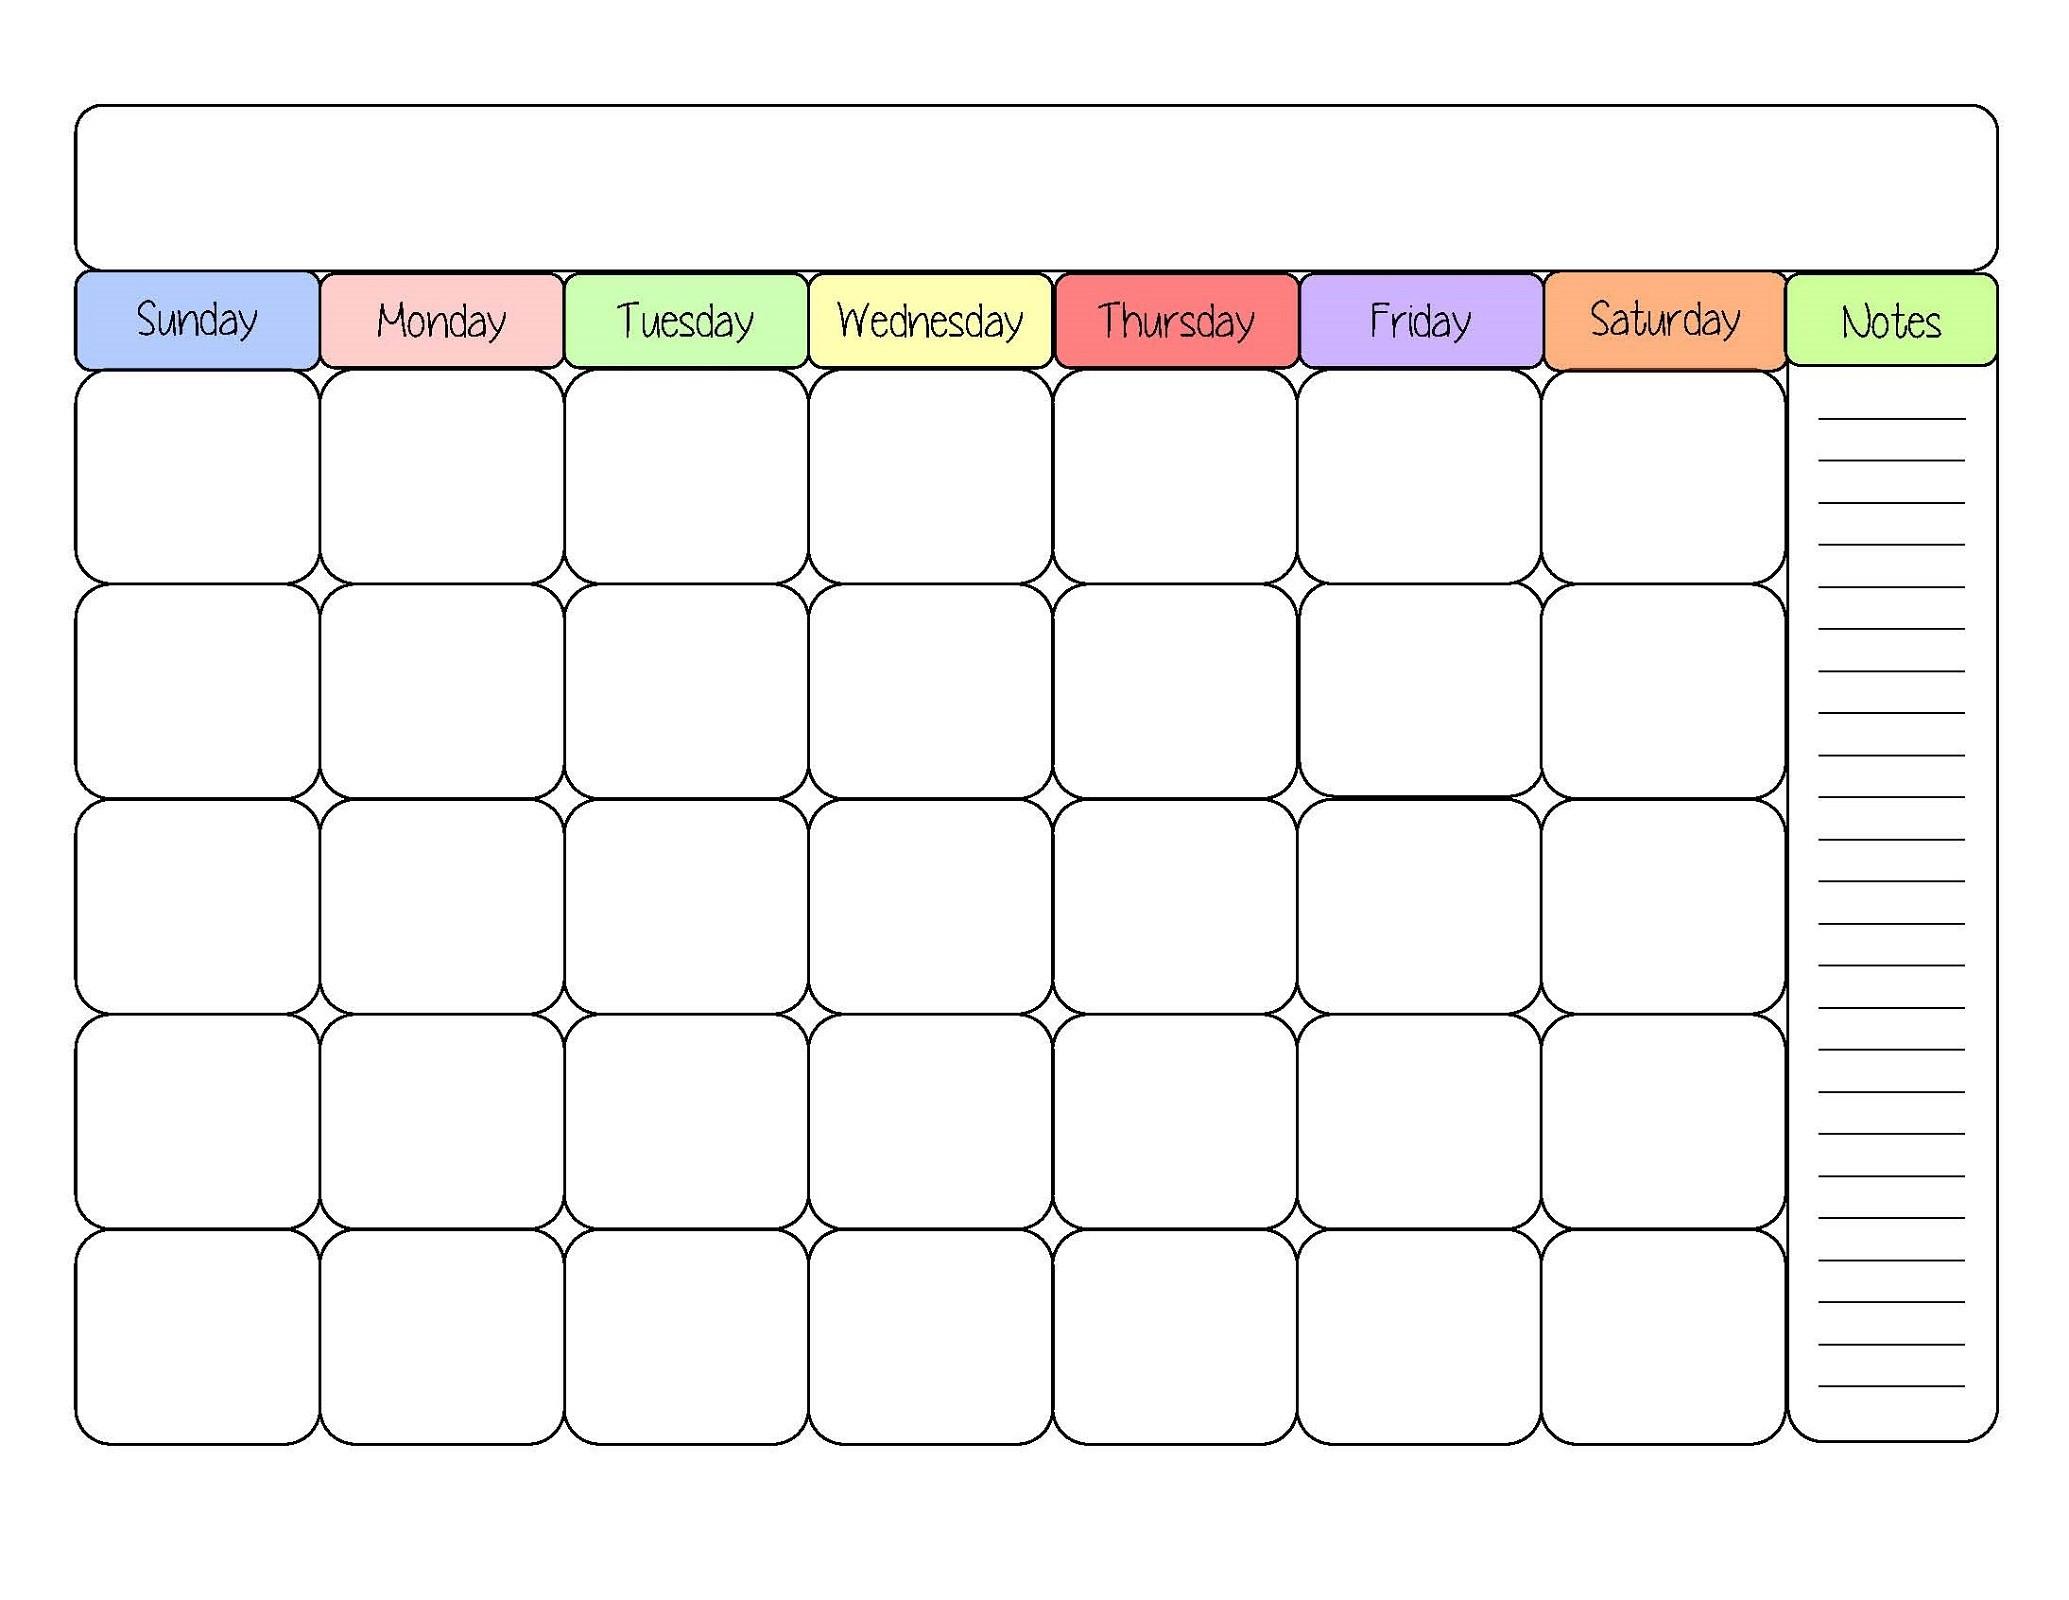 Free Printable Calendar Templates Interesting In Fill In Calendar inside Fill In Blank Calendar